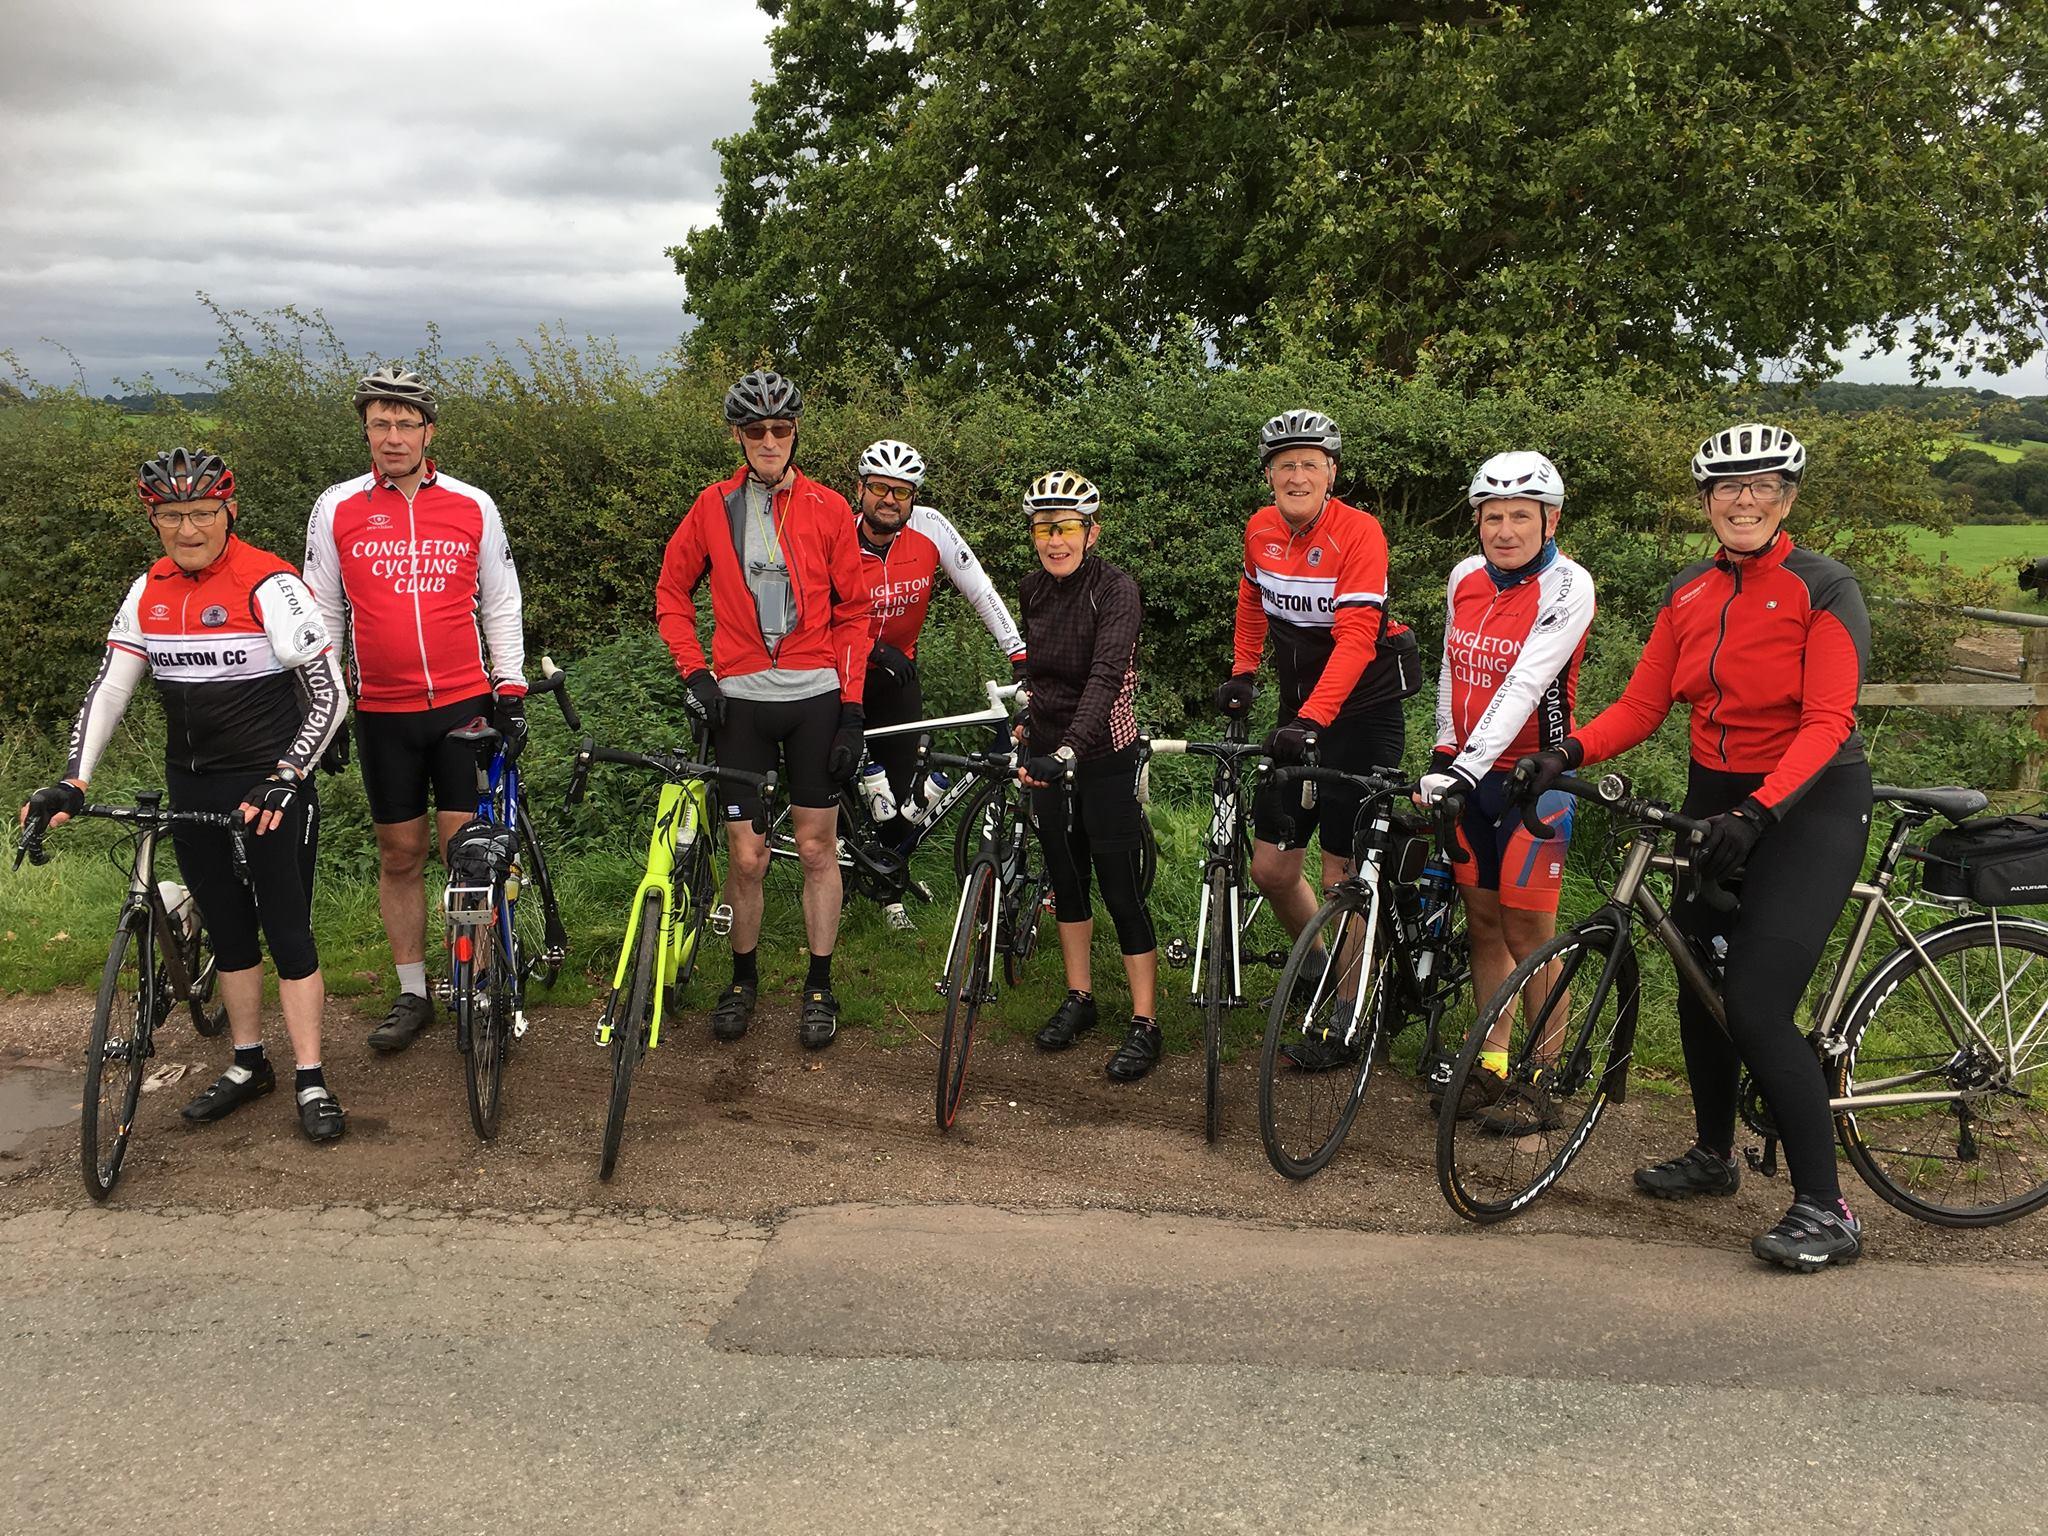 Congleton Cycling Club en-route near Eccleshall